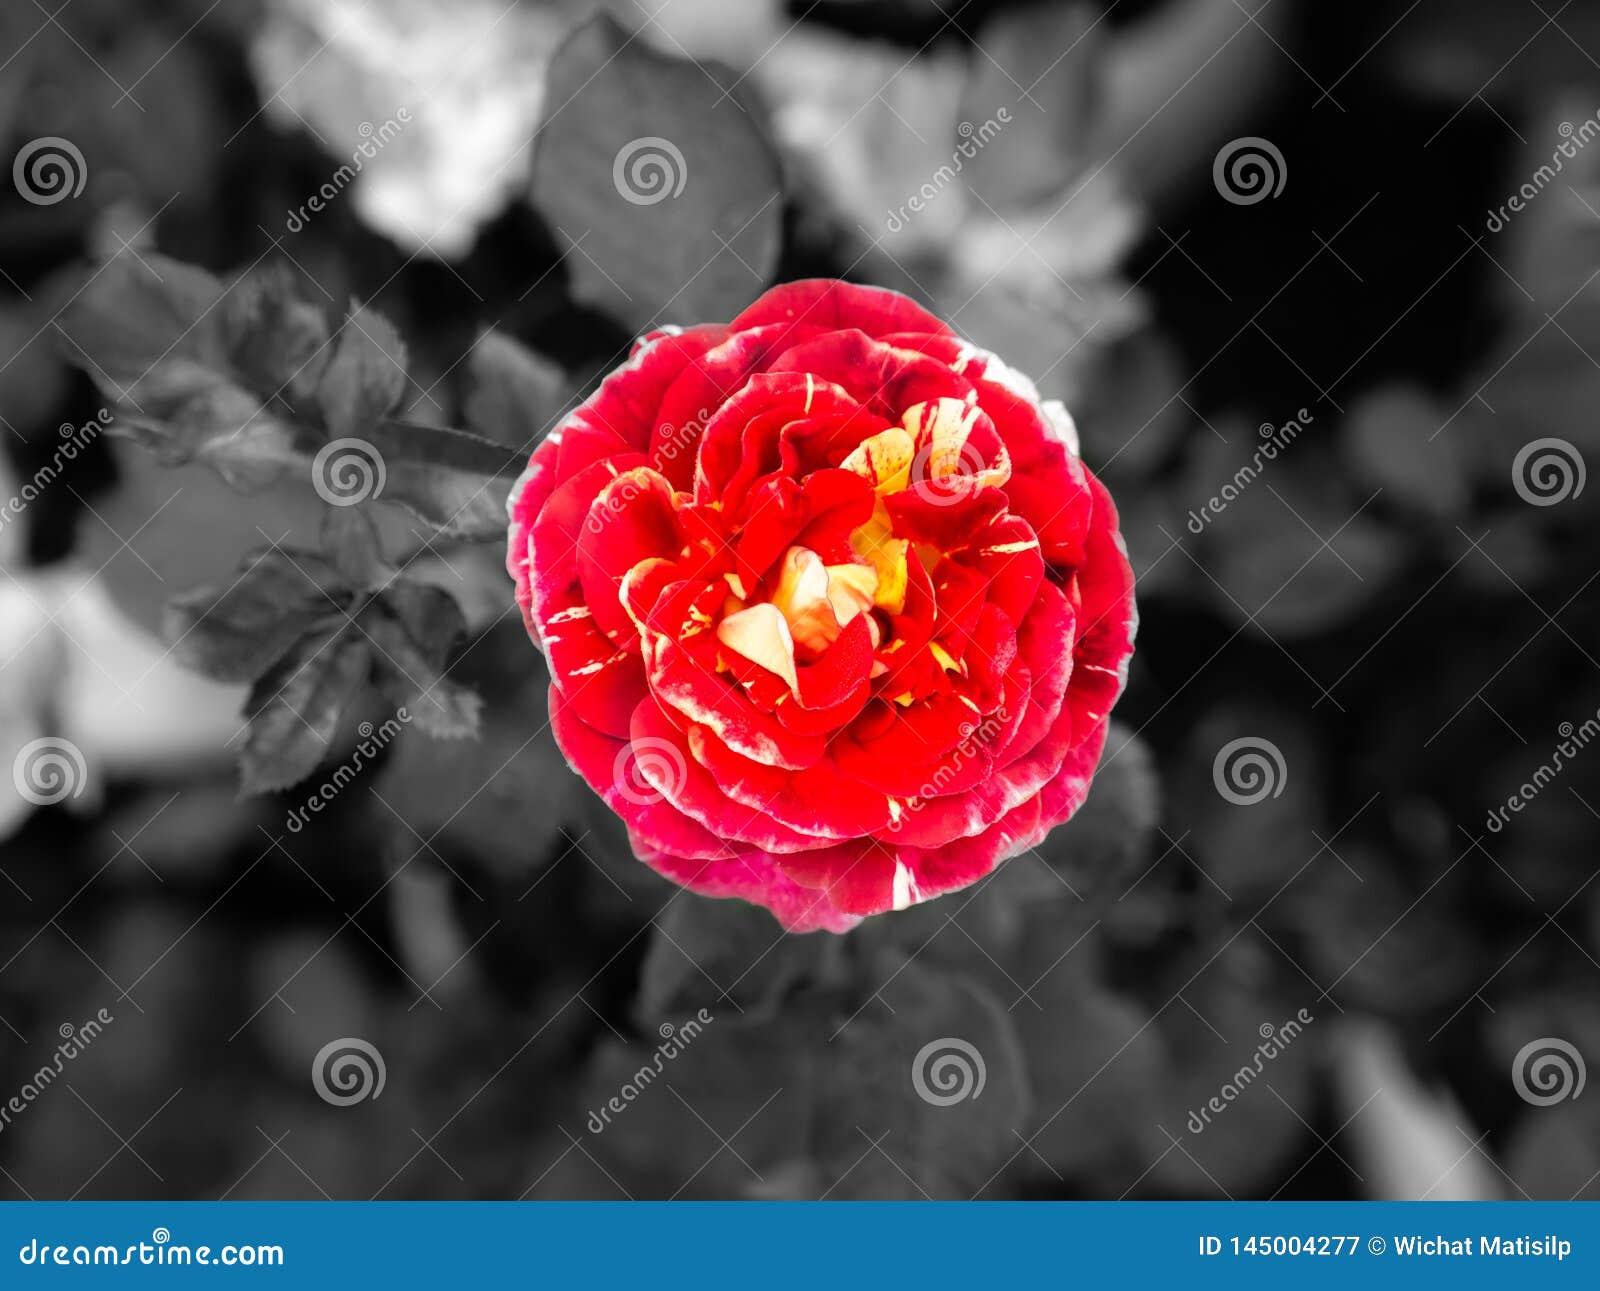 Dauwdalingen op Rode Gele Rose Flower